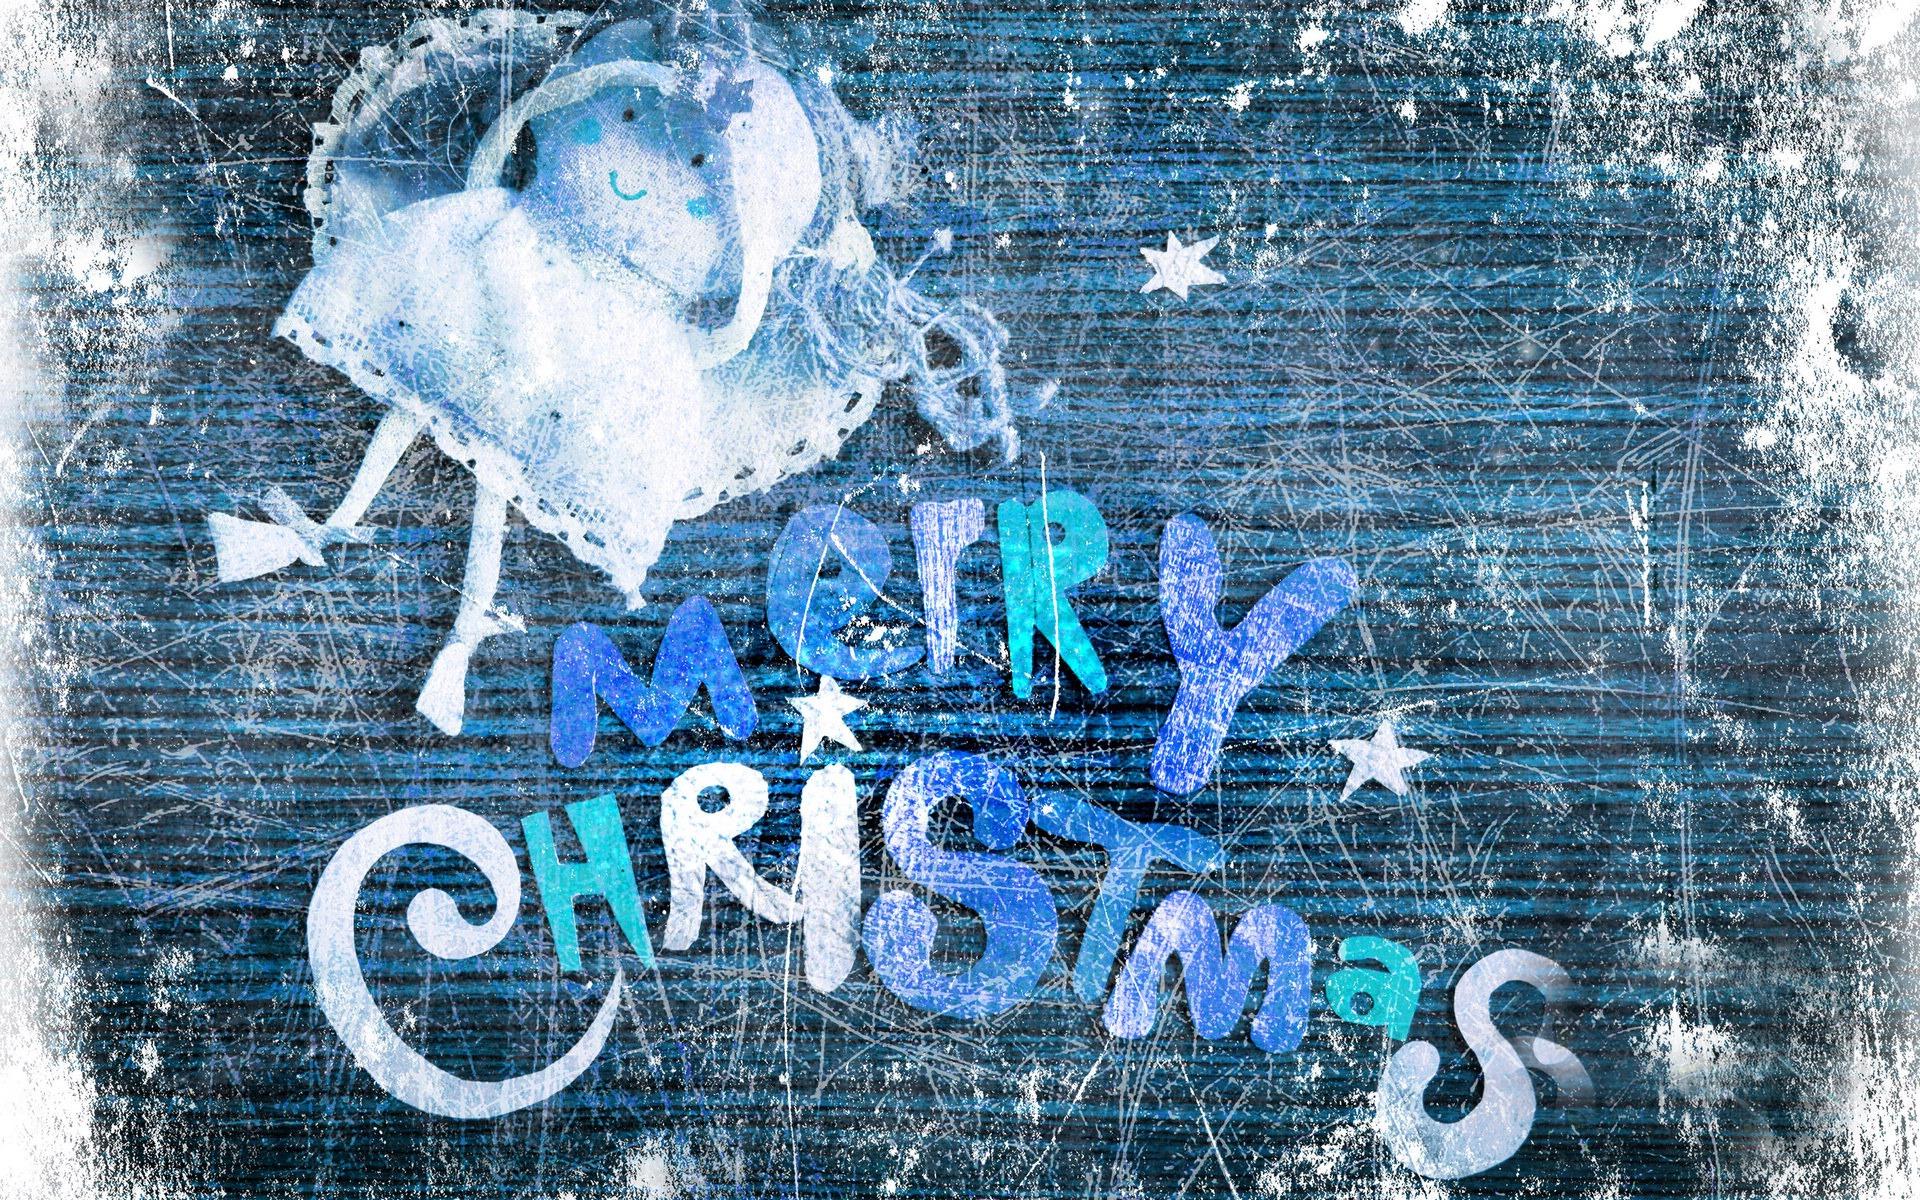 Wallpapers For Desktop Christmas Frozen HD Wallpapers 1920x1200